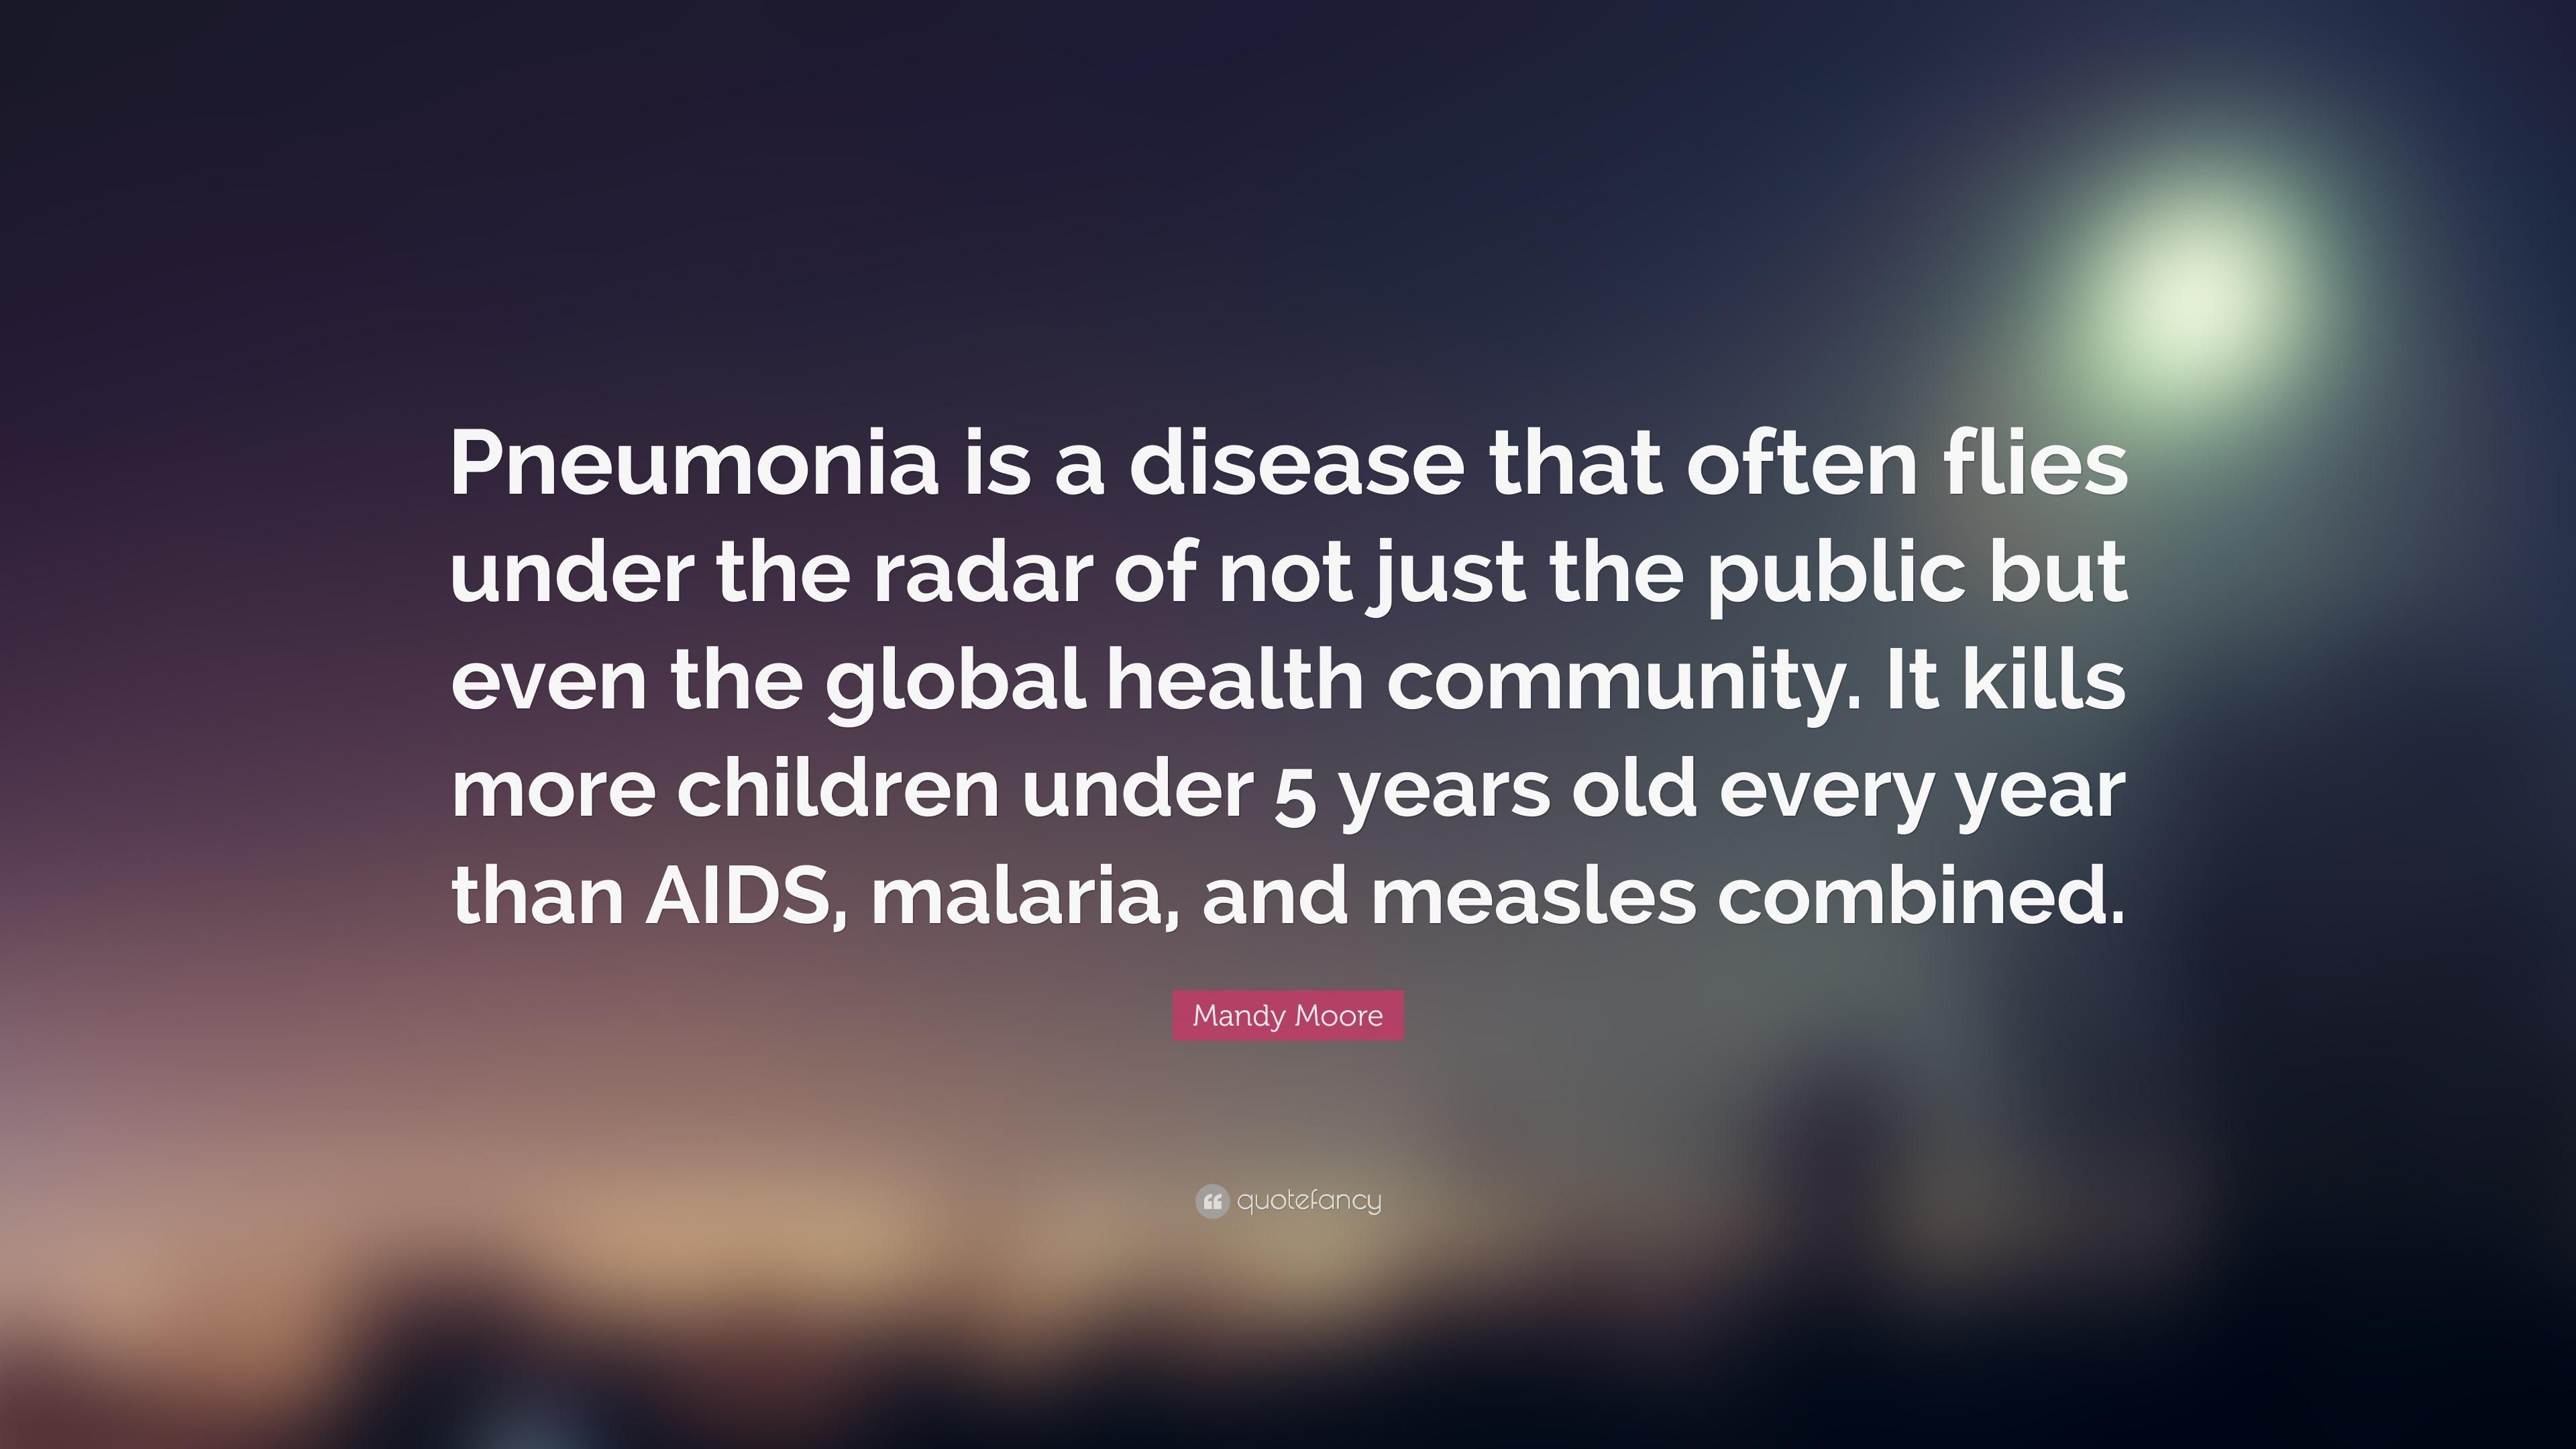 Mandy Moore Quote Pneumonia Is A Disease That Often Flies Under The Radar Of